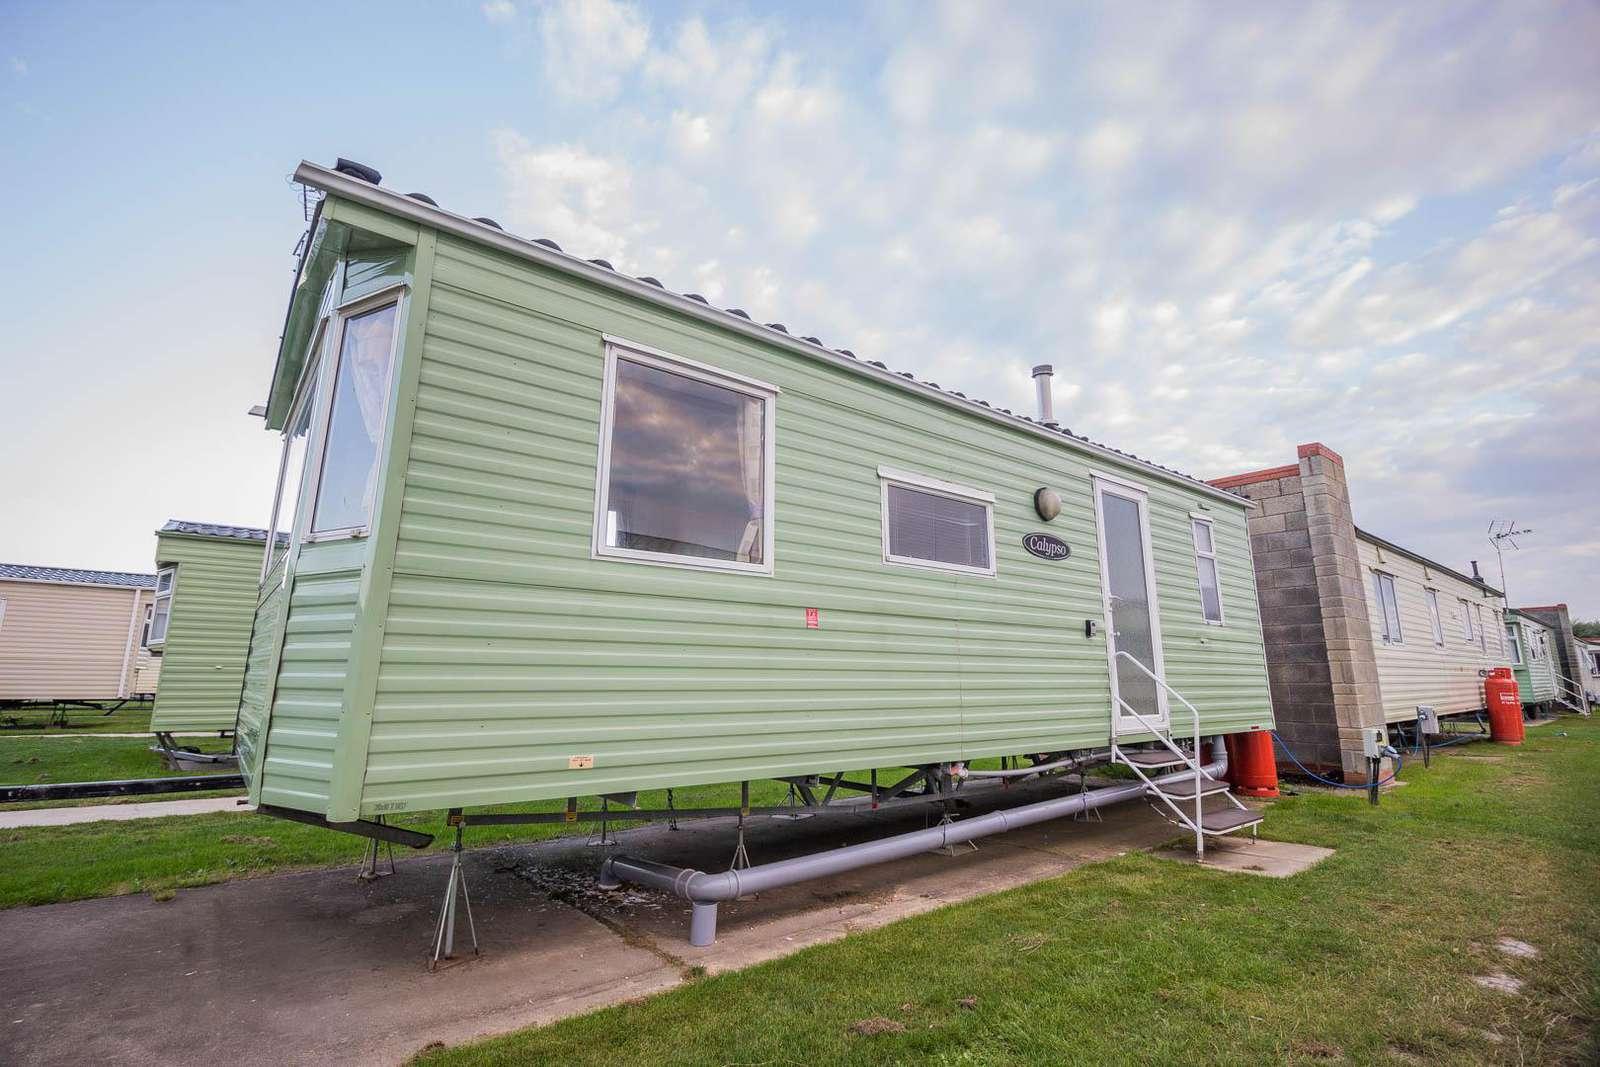 17104P – Pines area, 2 bed, 6 berth caravan. Emerald rated. - property